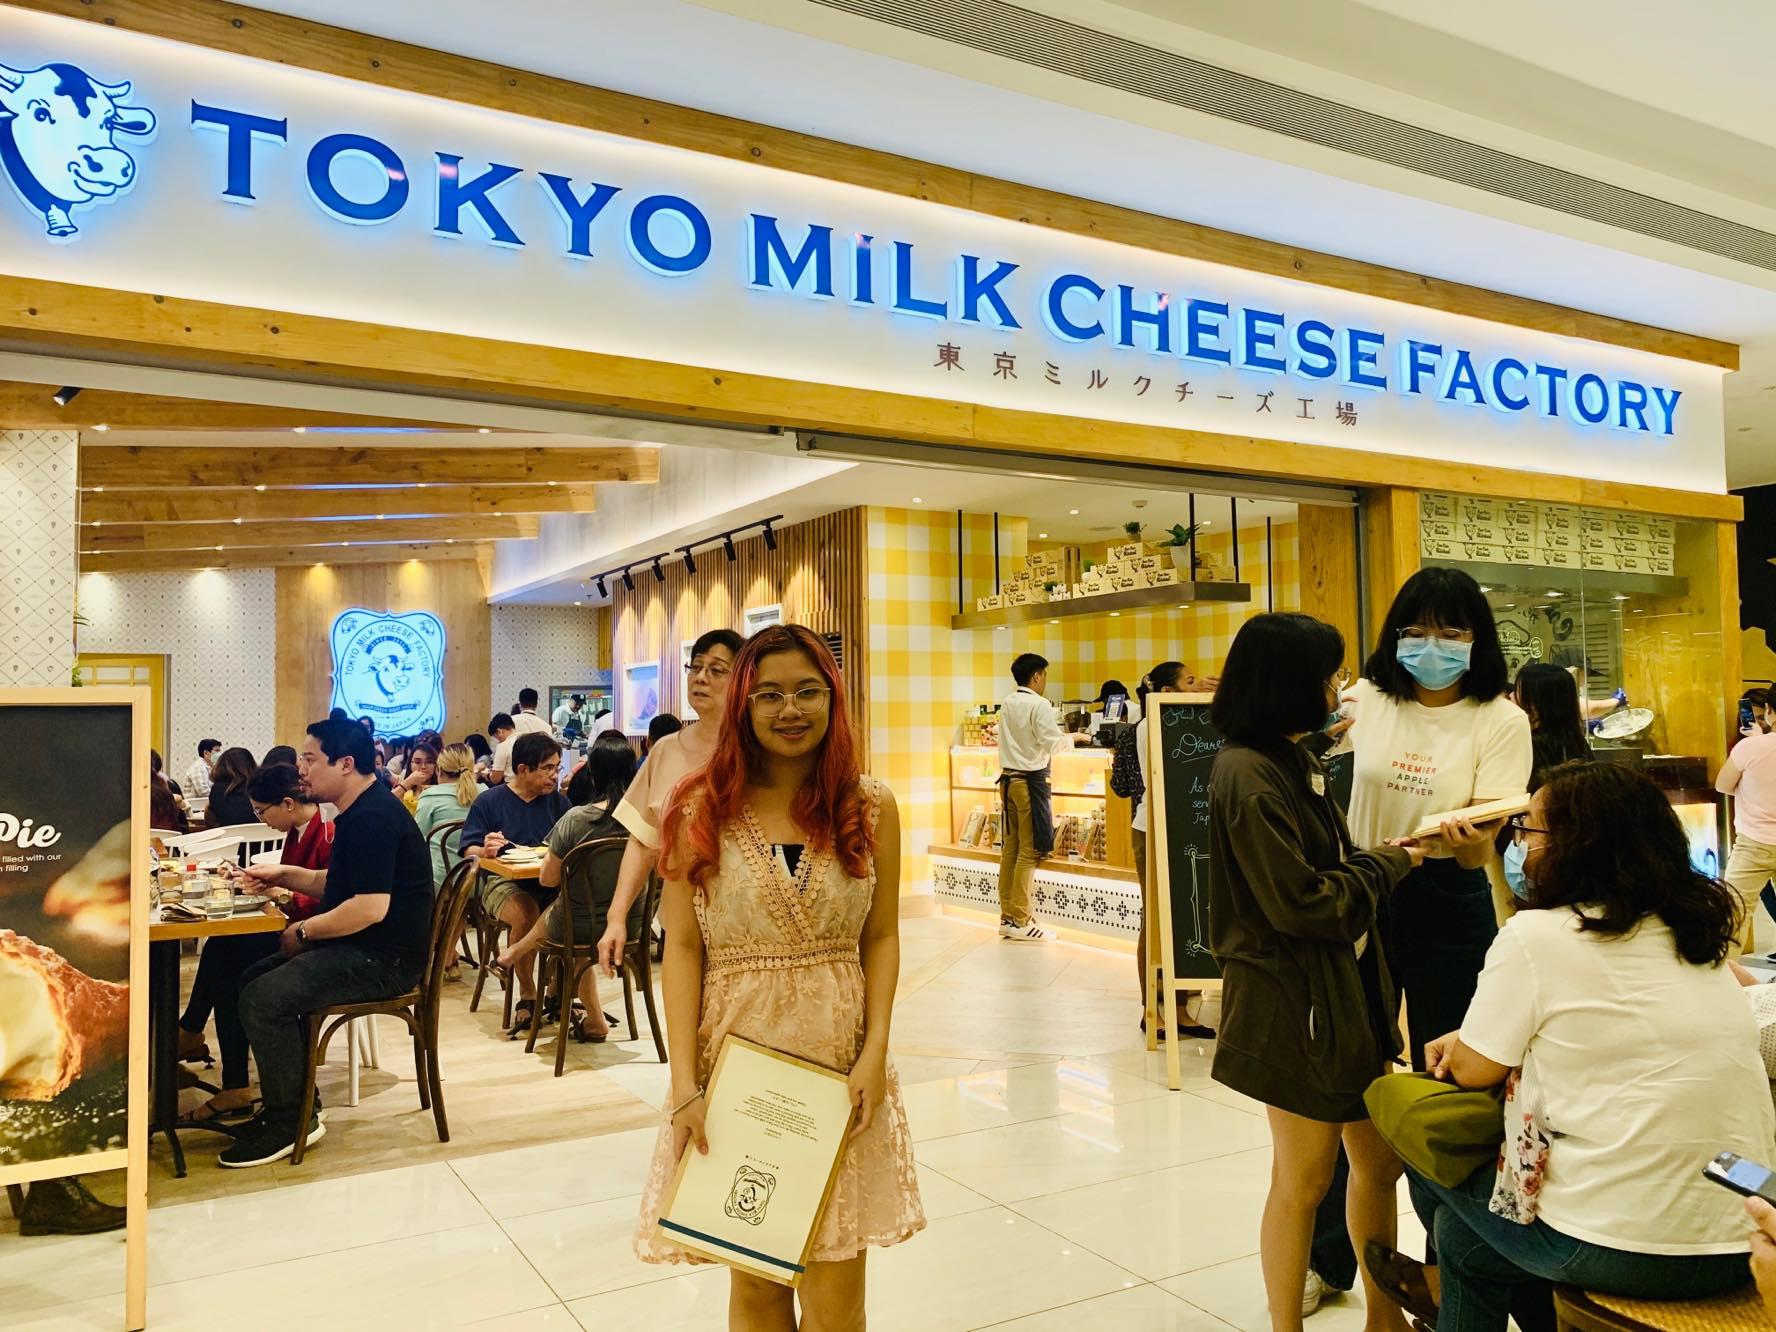 Tokyo Milk Cheese Factory Estancia